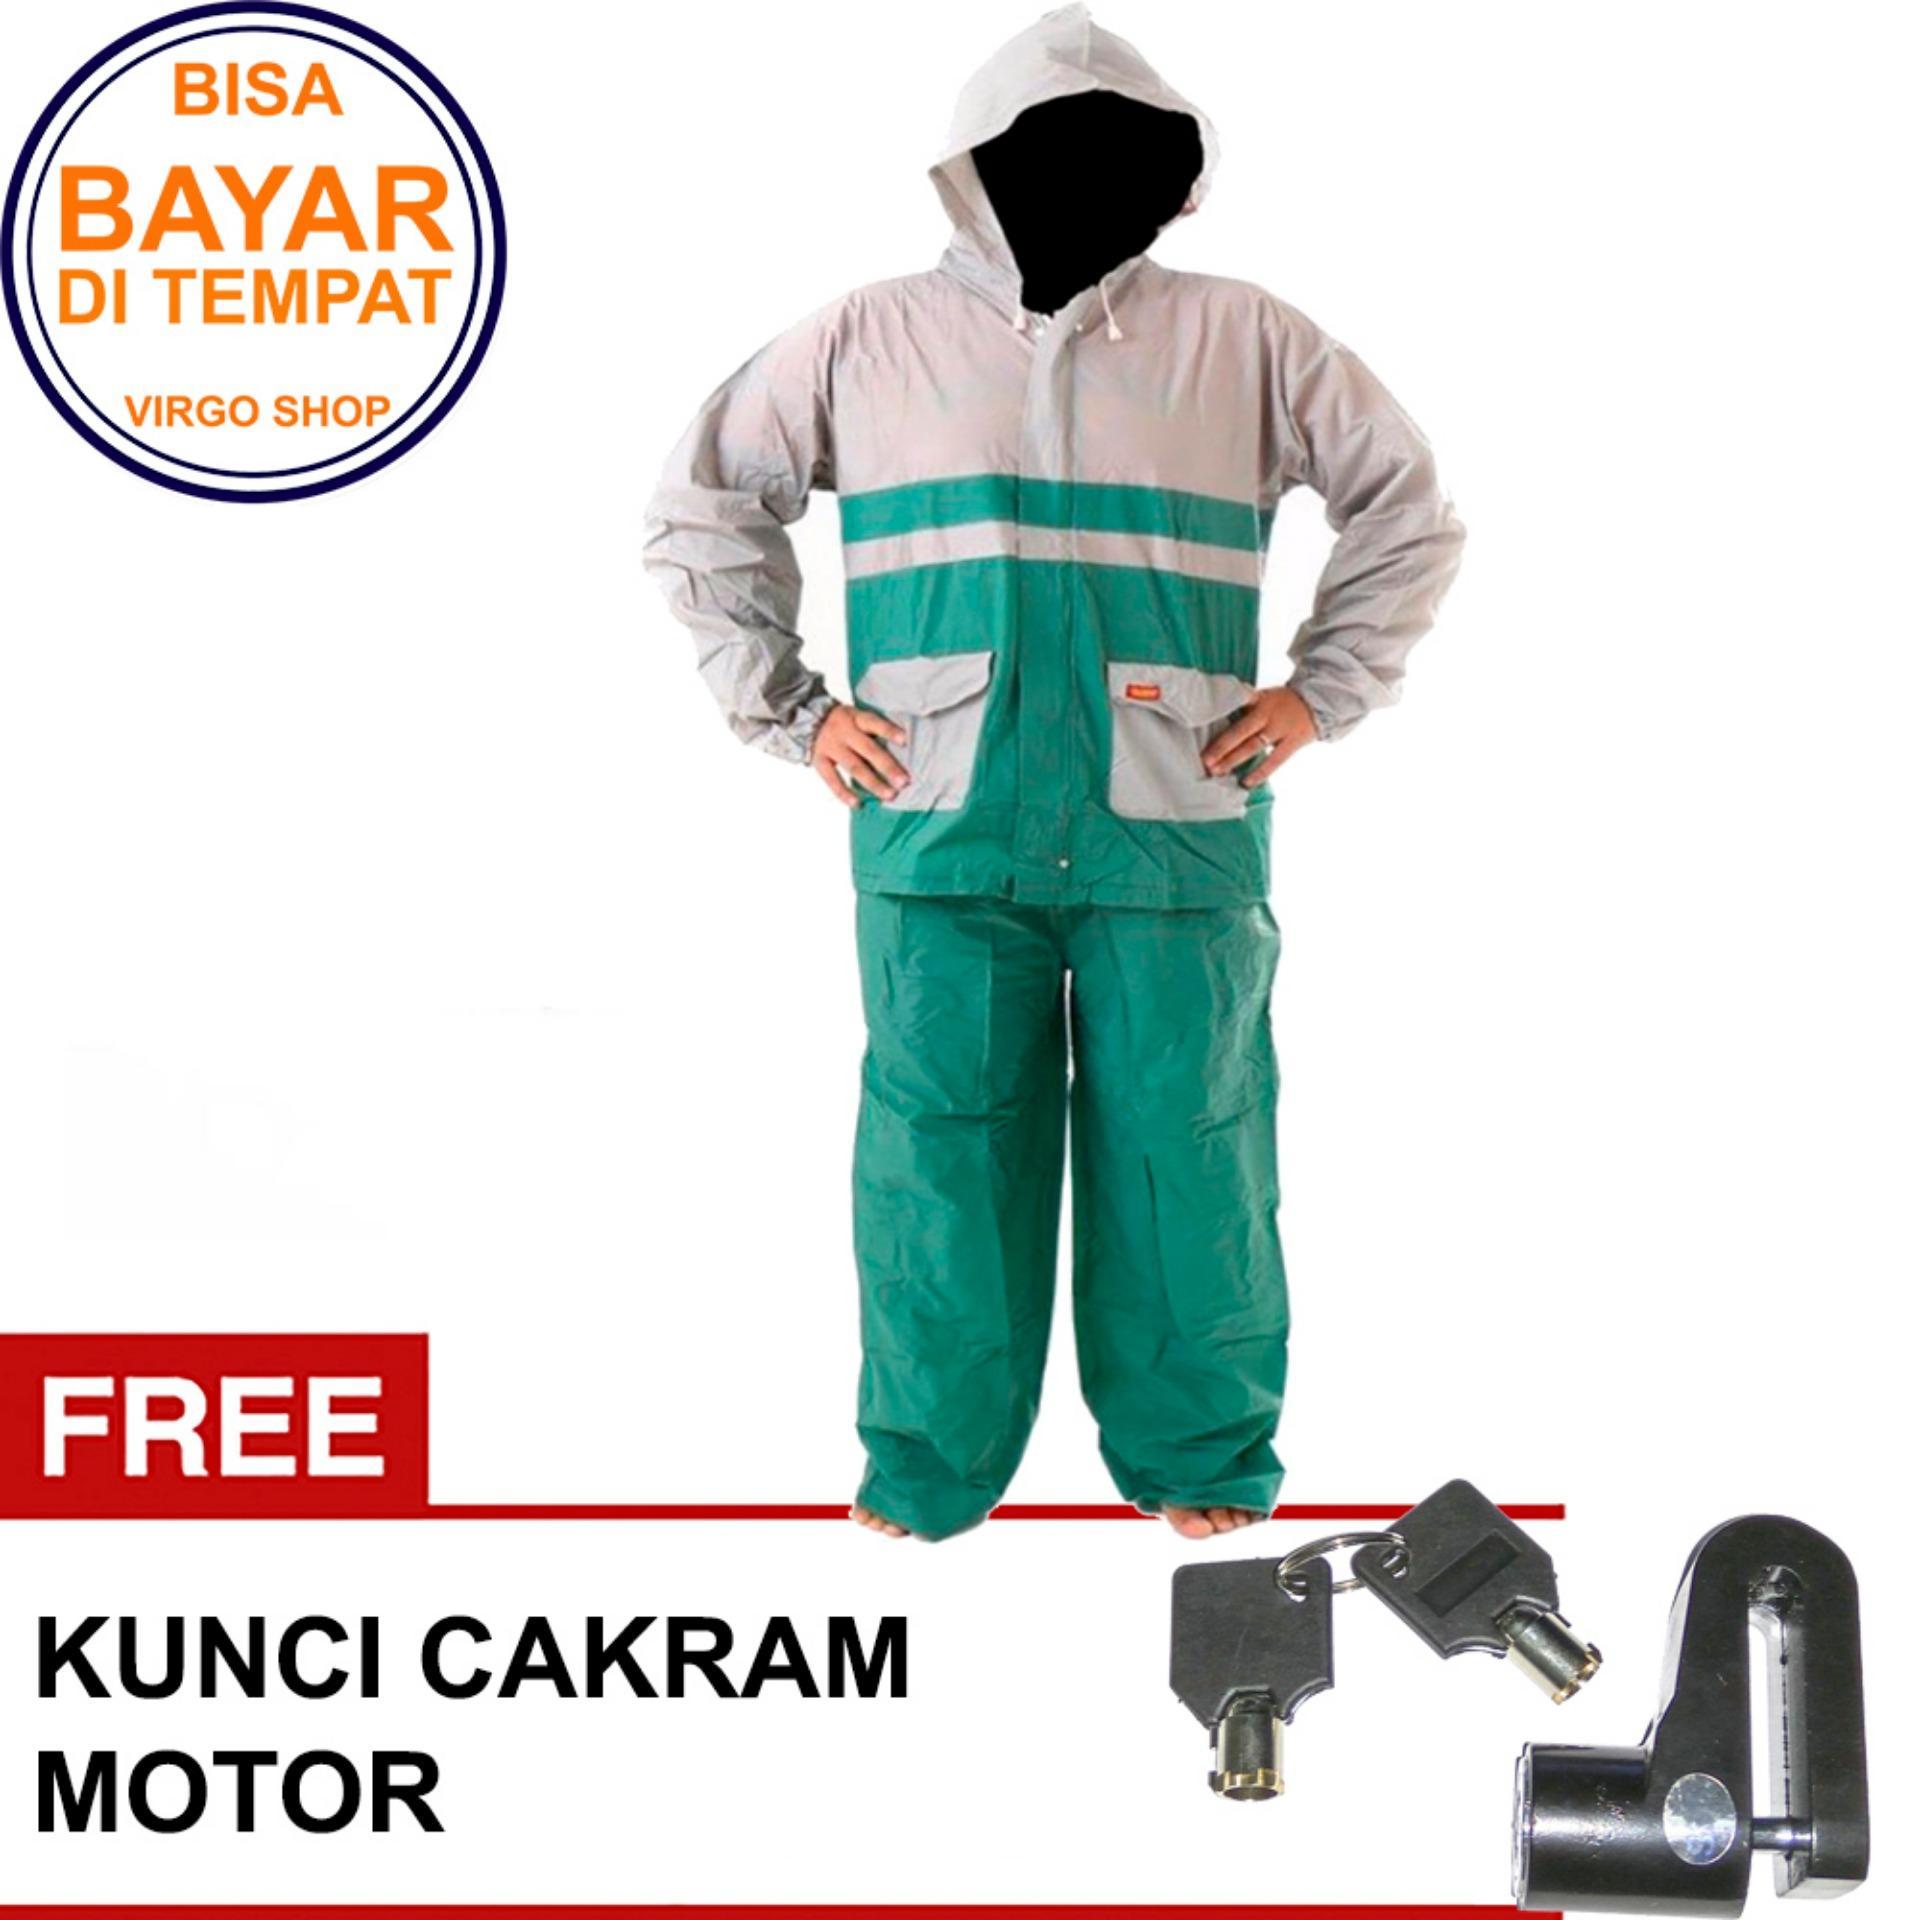 Termurah Elmondo Jas Hujan Setelan Baju Celana - New Kombinasi Tipe 905 Hijau Bonus Kunci Disk Pendek